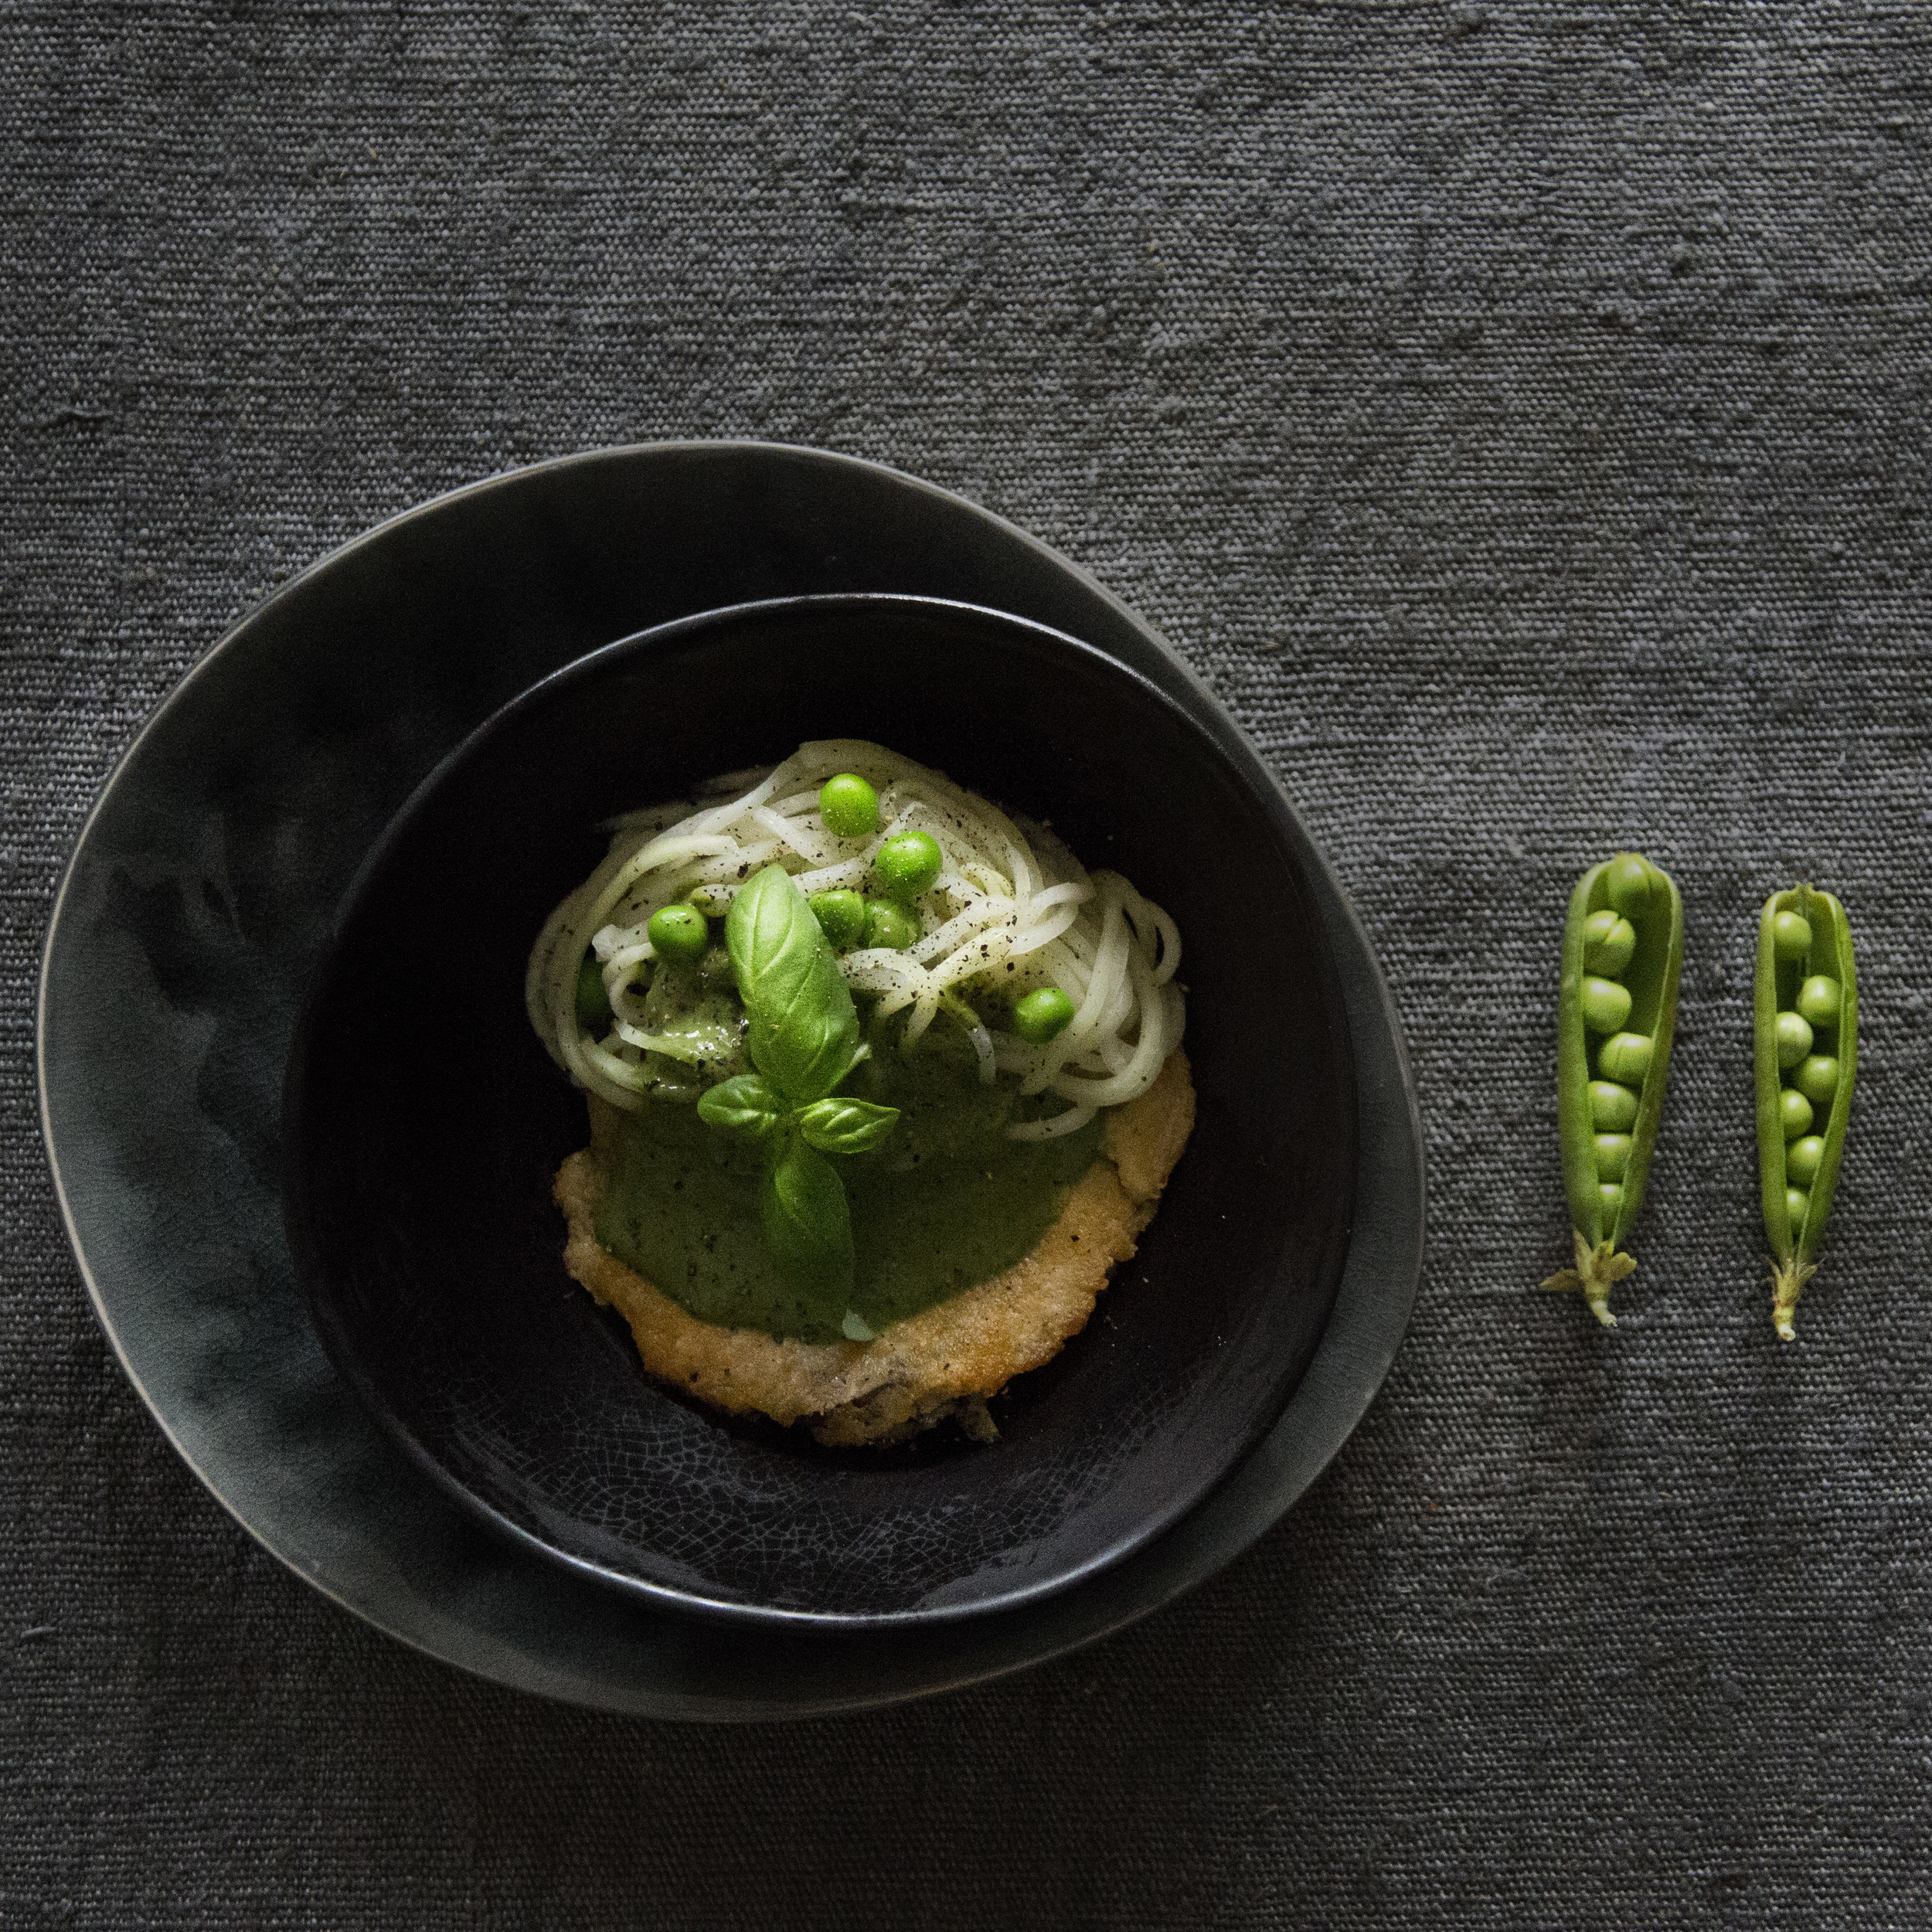 aubergine2-4x4-2.jpg